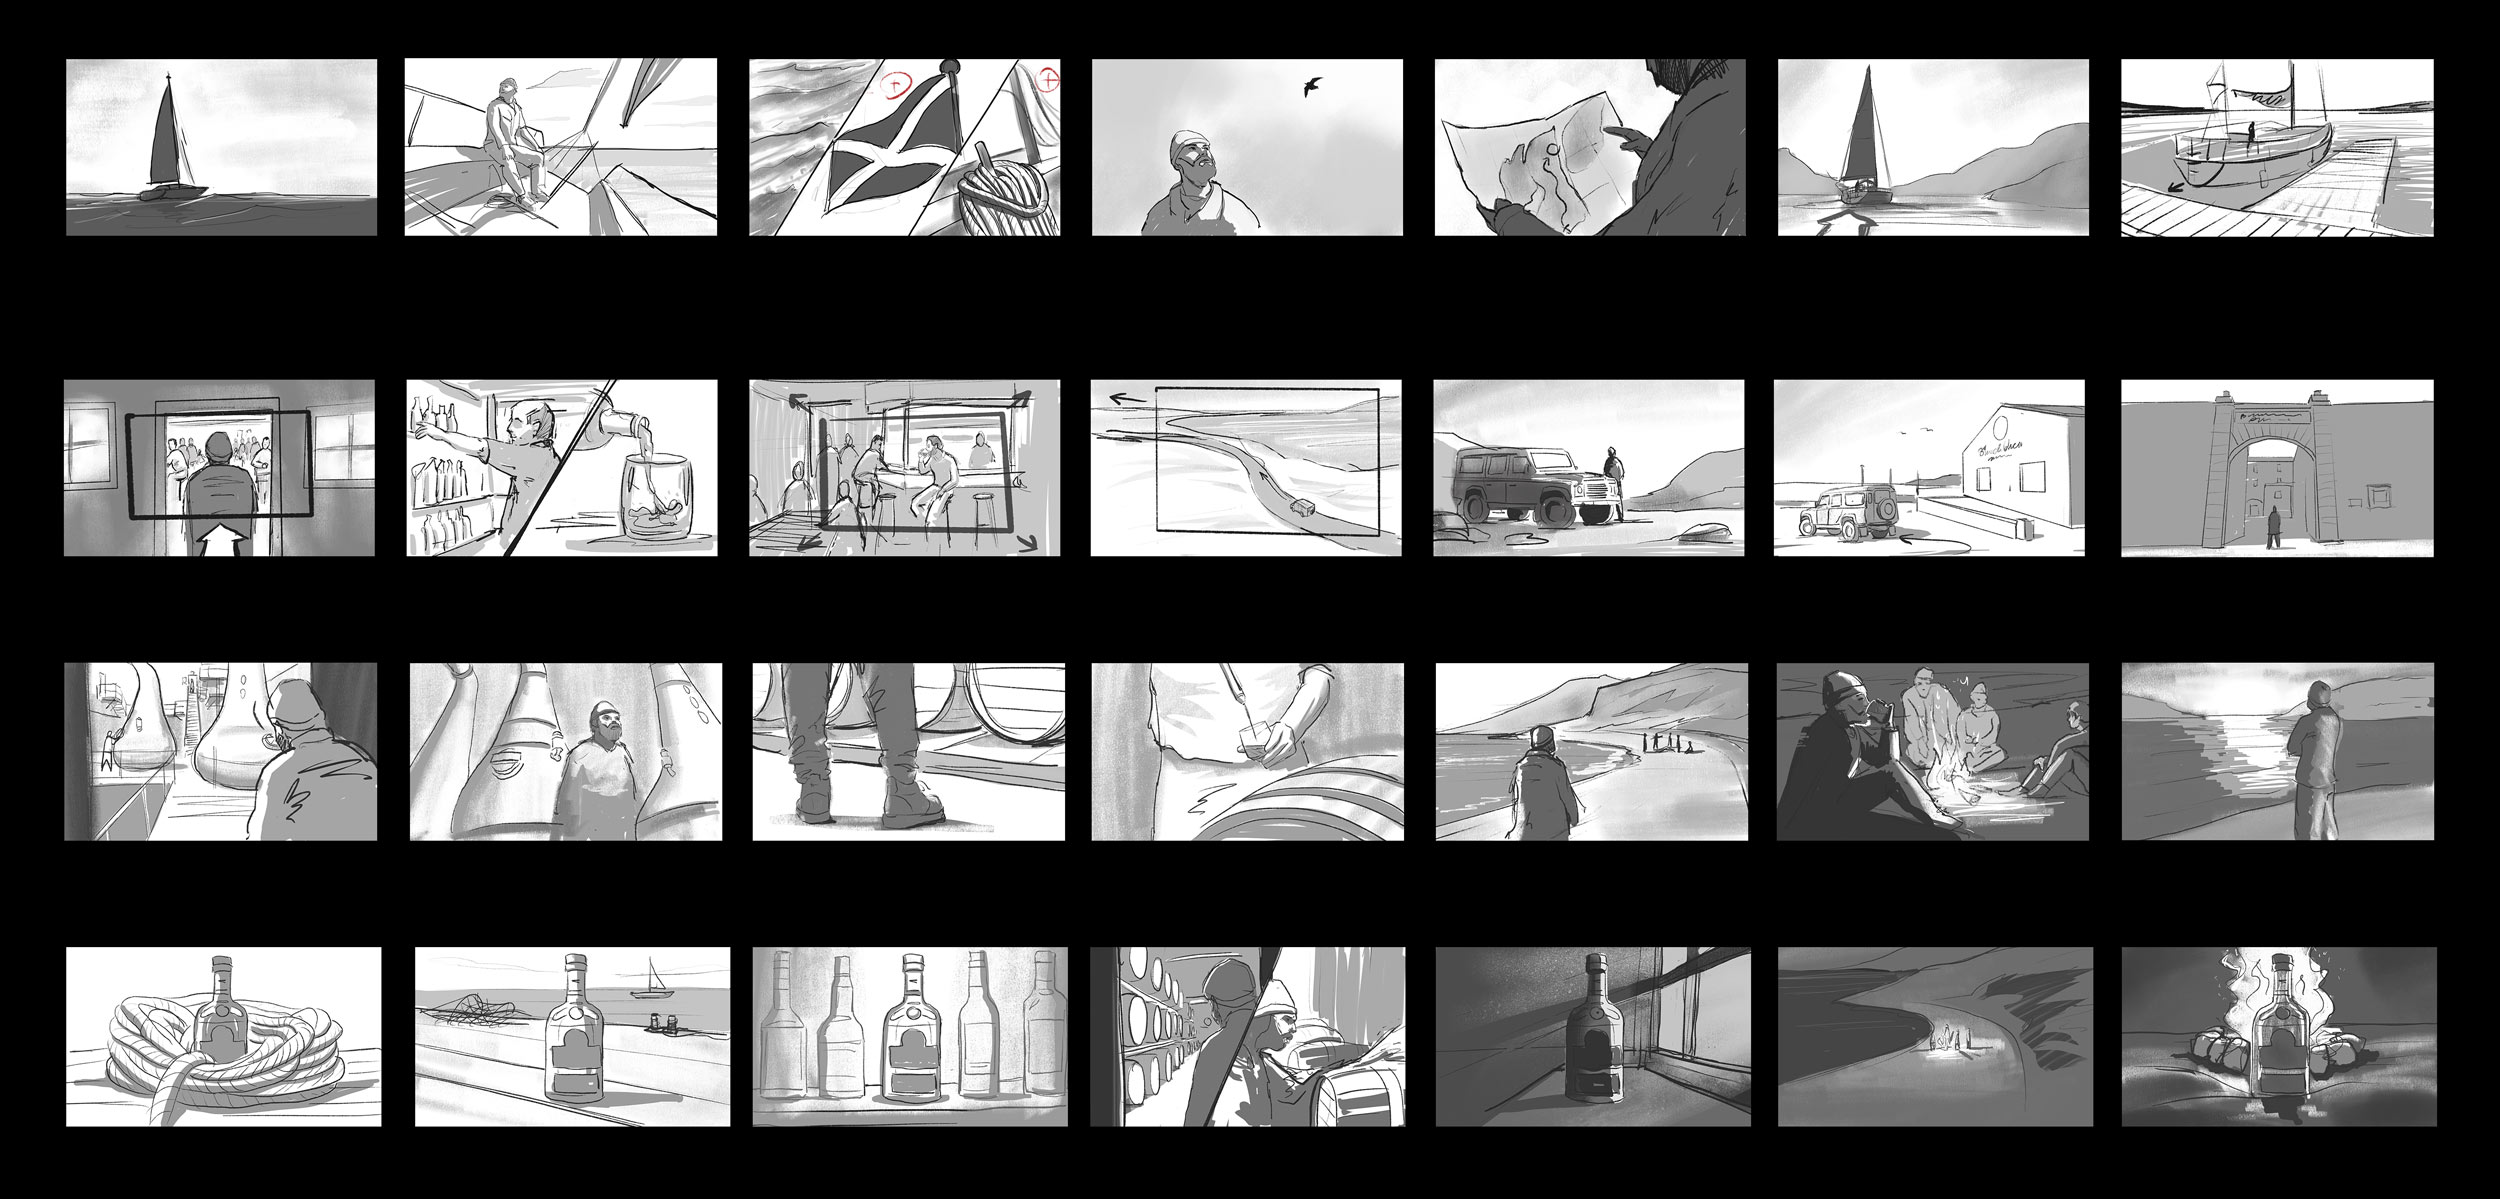 Bunnahabhain whiskey advertisment full storyboard for Campfire agency by Jakub Cichecki